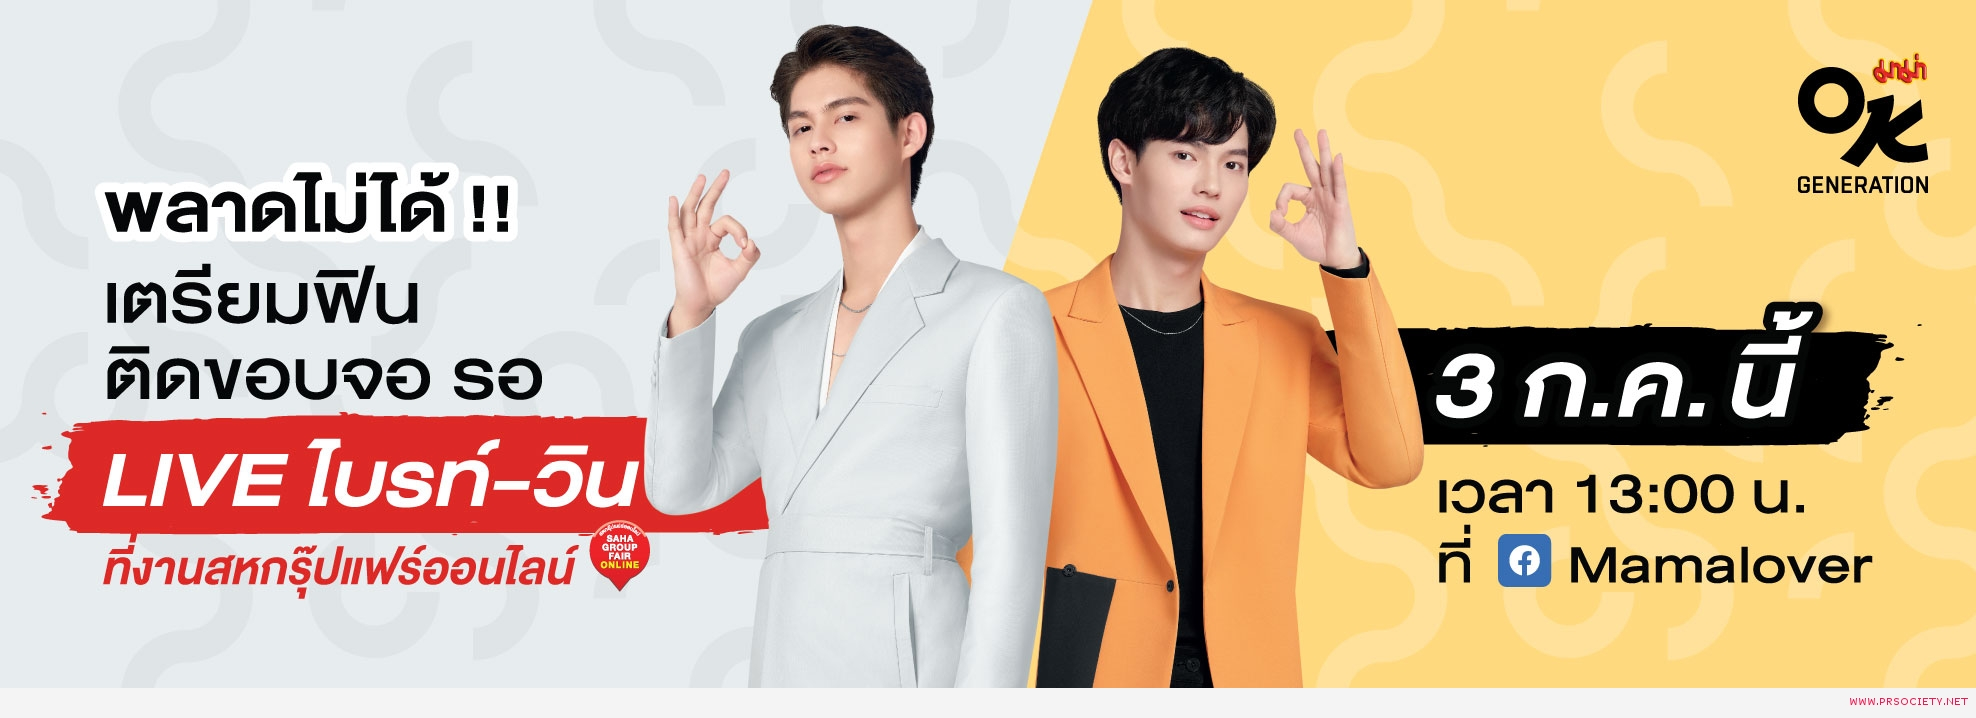 banner-promote_re01-ไบร์ทวิน